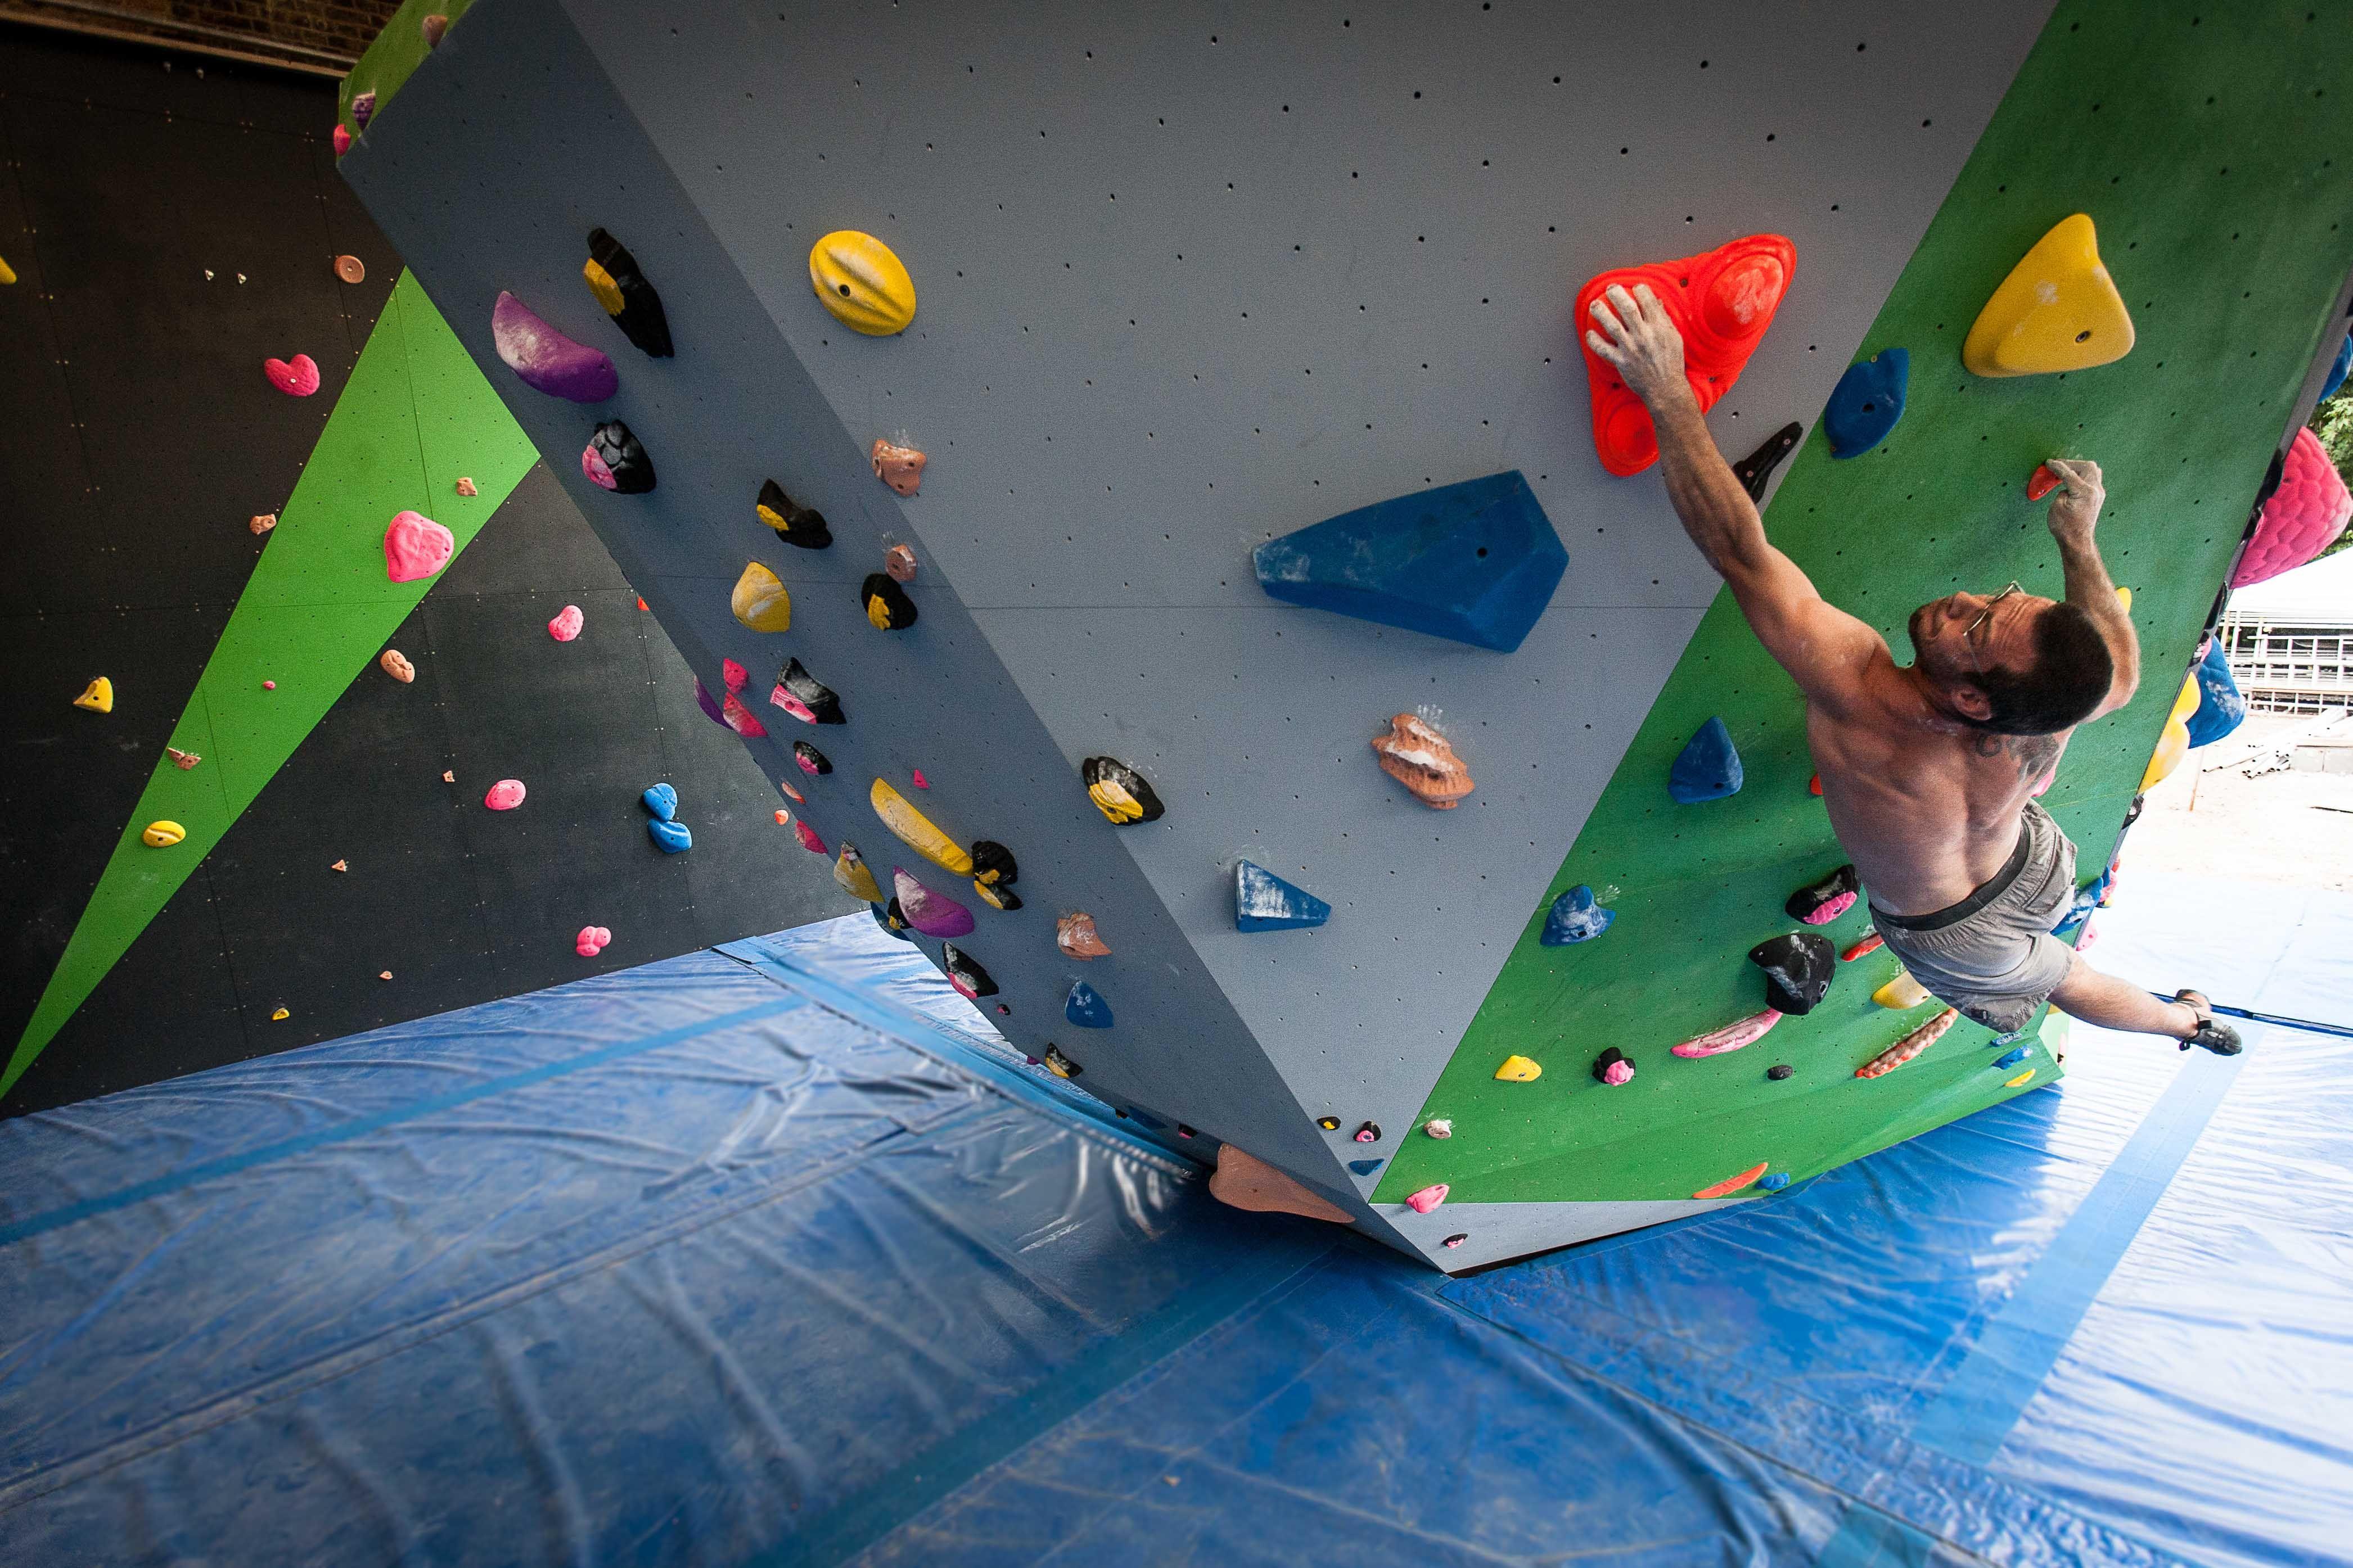 Pildiotsingu bouldering wall tulemus Pildiotsingu bouldering wall